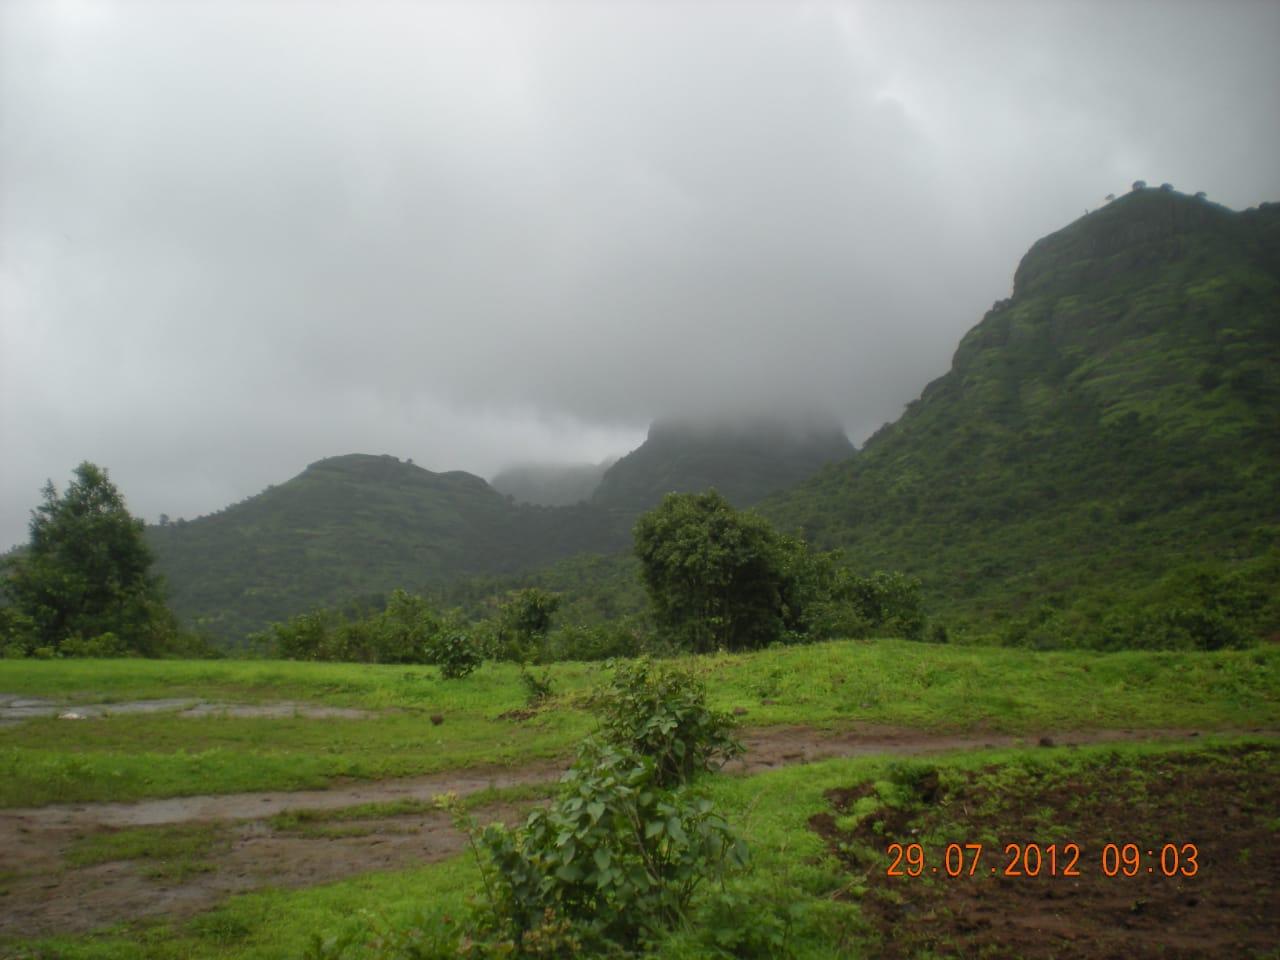 View from Kalsubai Trek, Western Ghats, Maharashtra